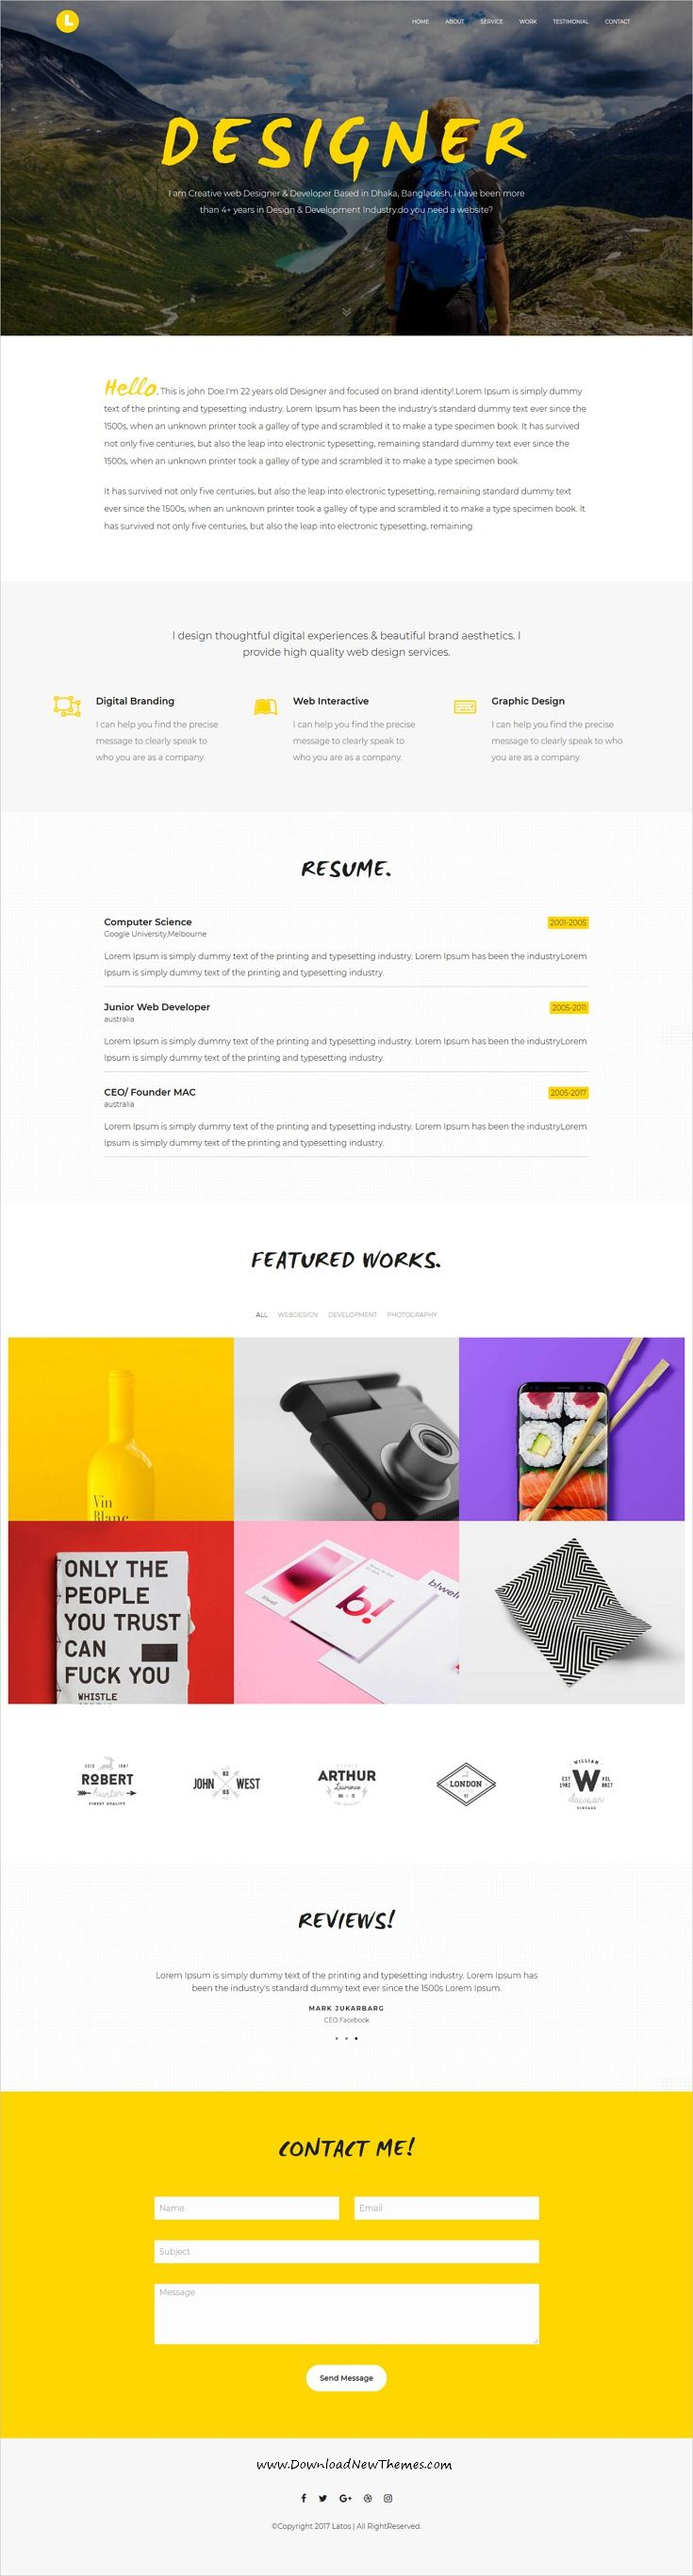 Latos - Creative Personal Portfolio Template | Personal portfolio